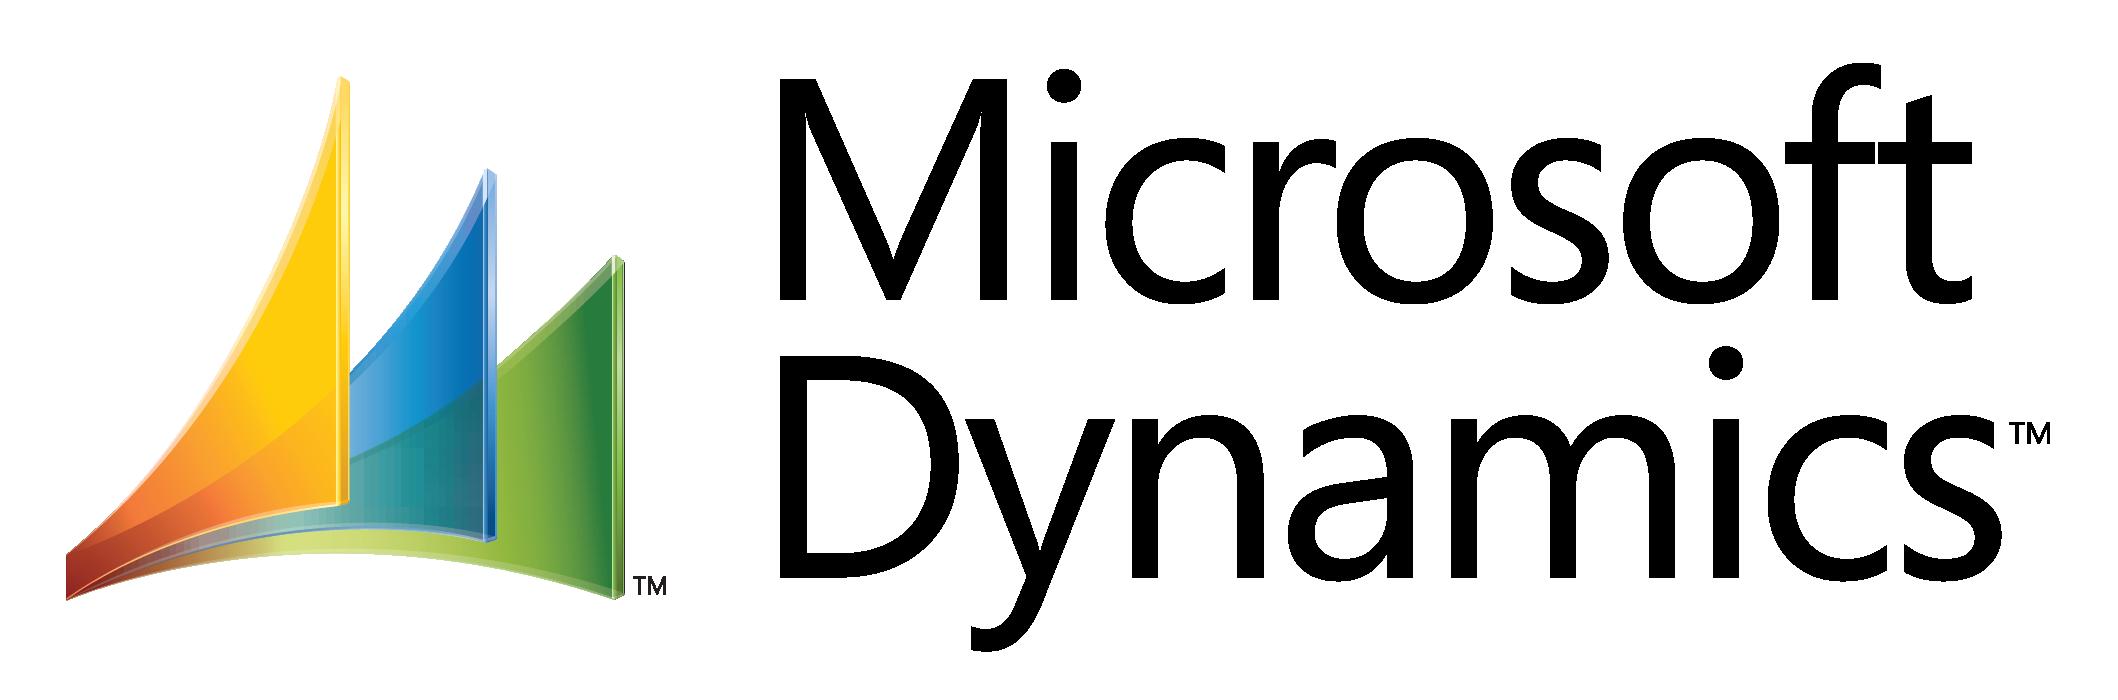 microsoft_dynamics_logo-Large.png